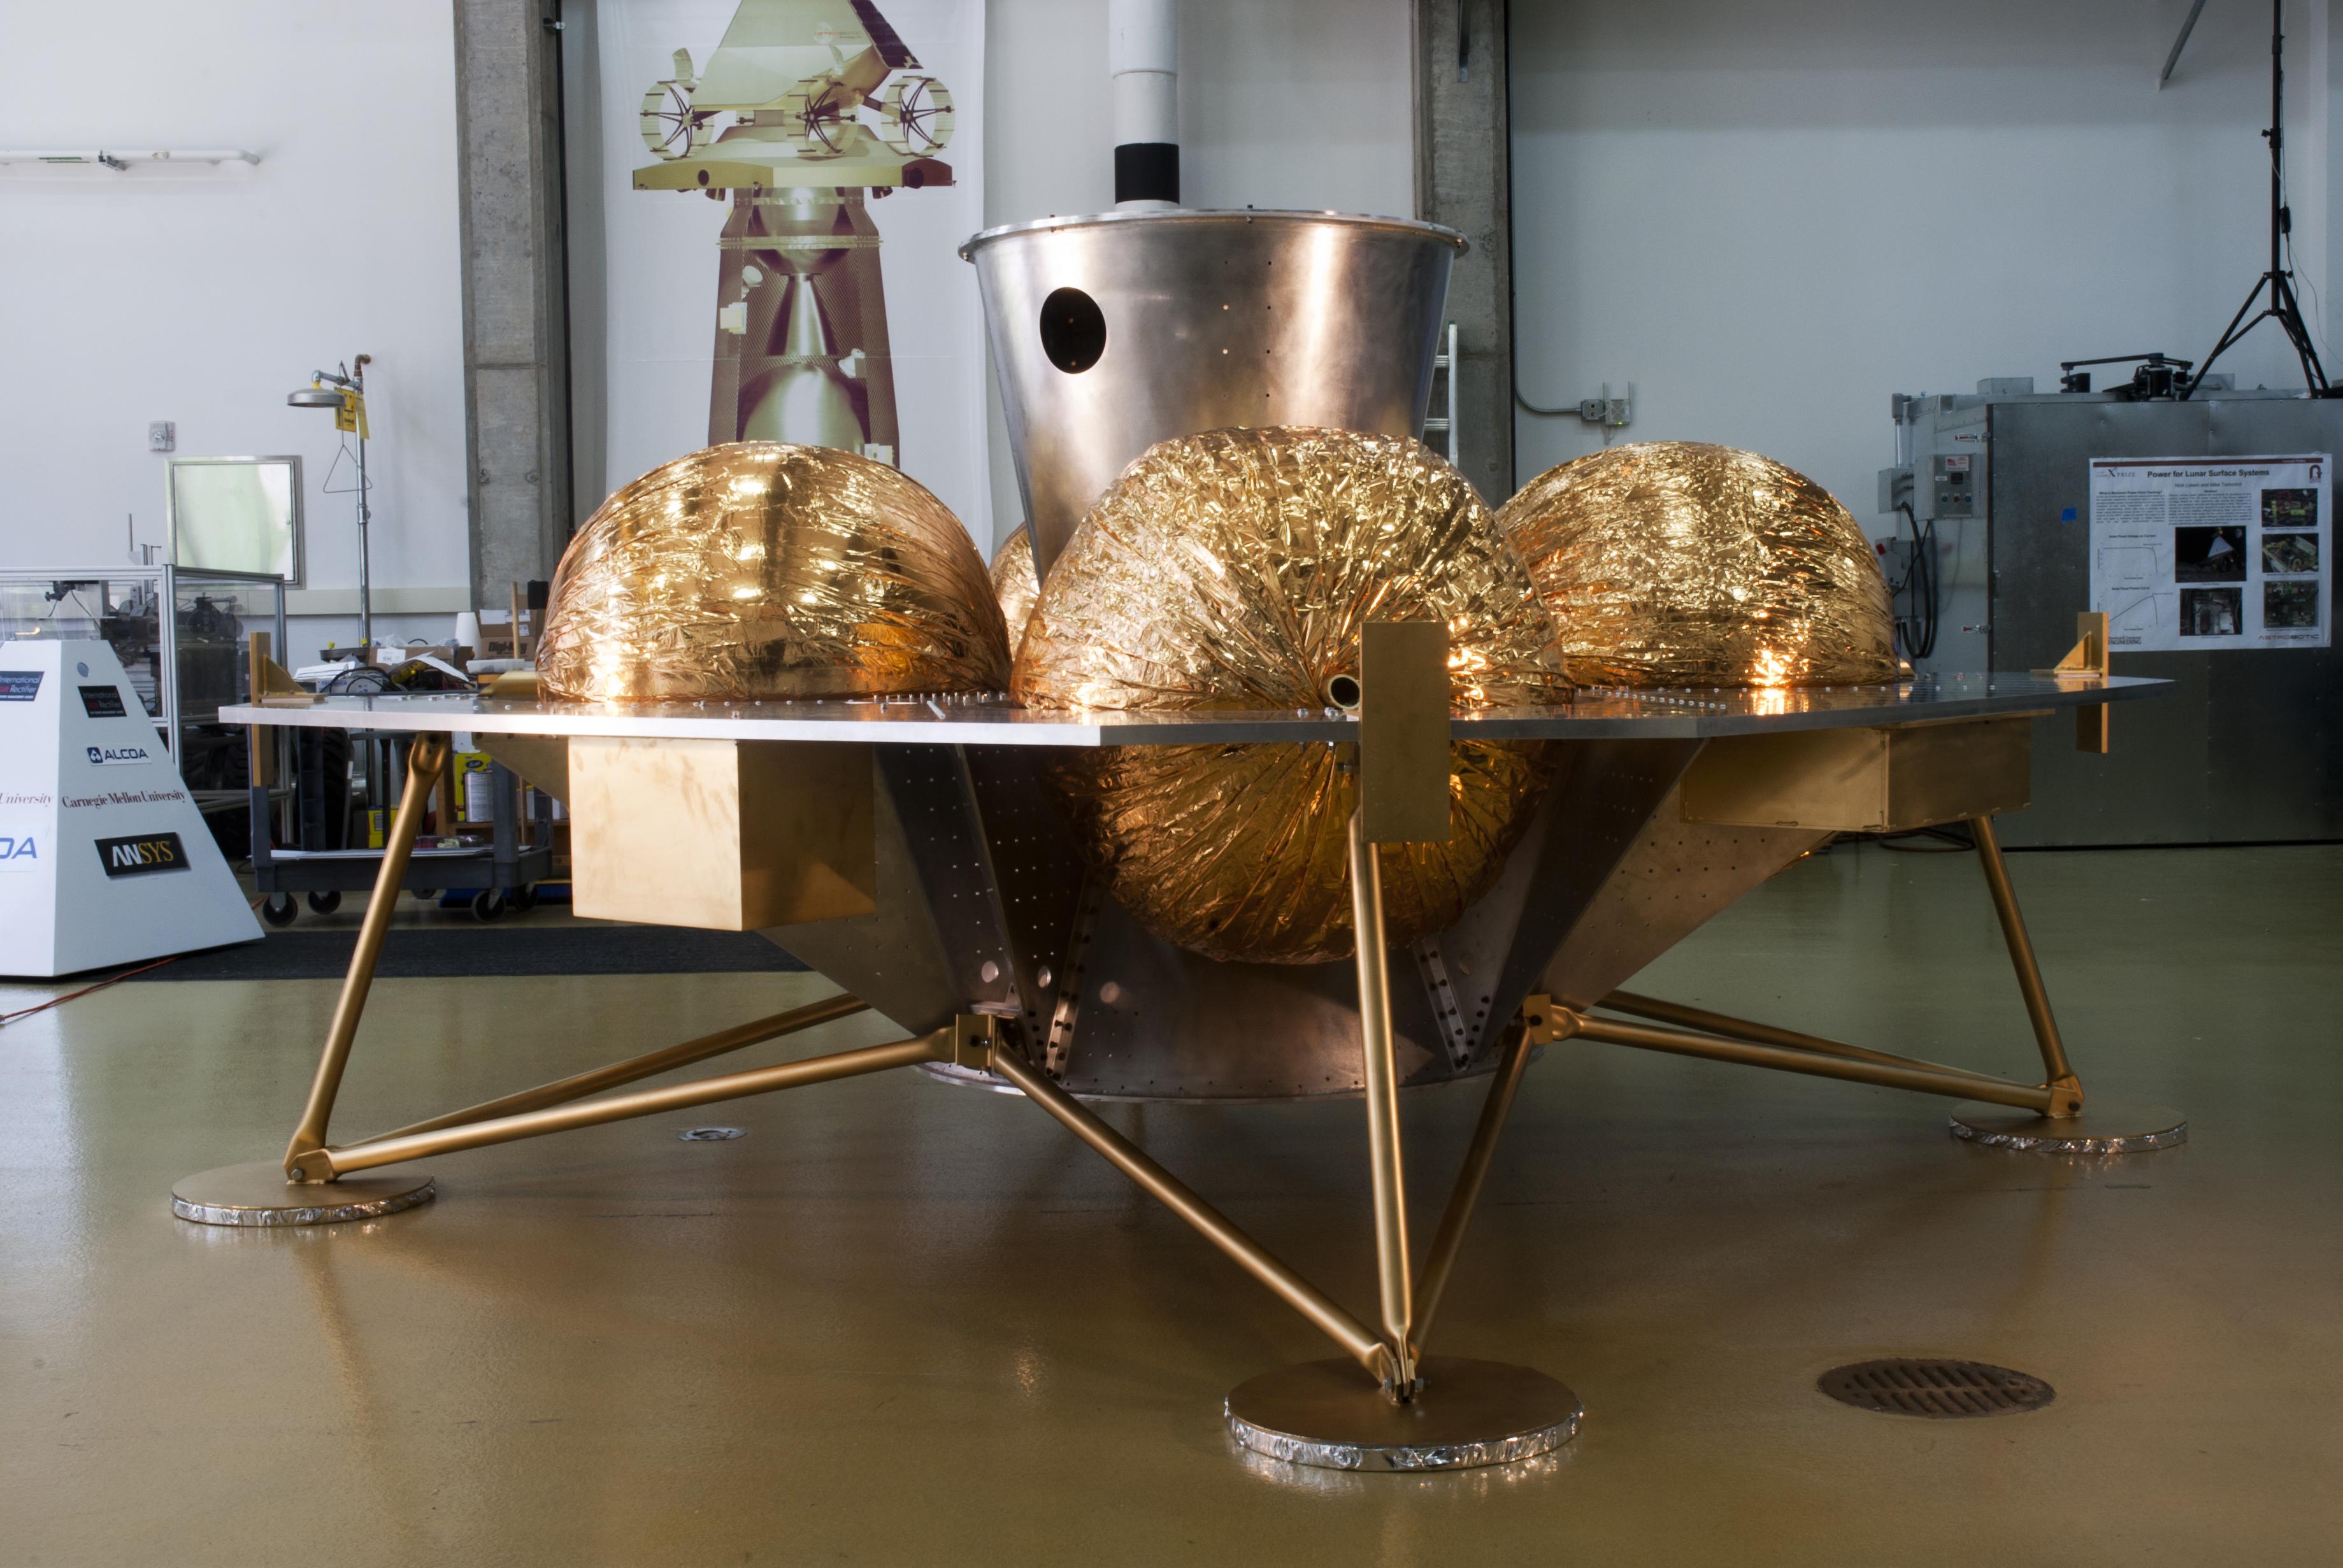 Astrobotic's Griffin Lander